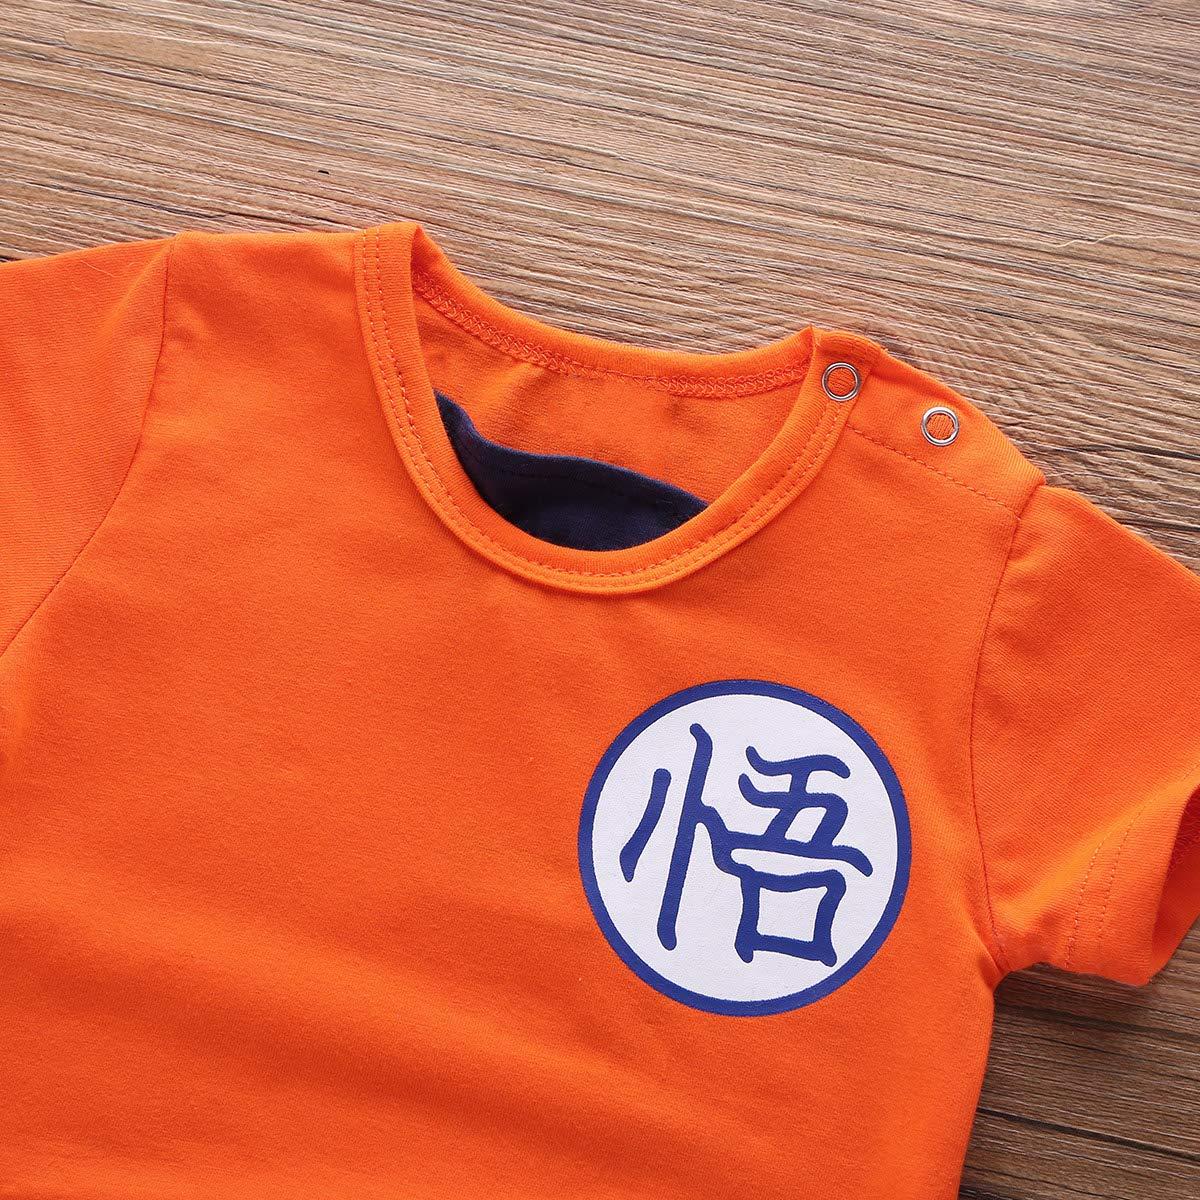 0-12 Meses YOOJIA Mono Disfraz de Goku Beb/é Ni/ños Mameluco Divertido S/úper H/éroe Peleles Romper Disfraz Infantil